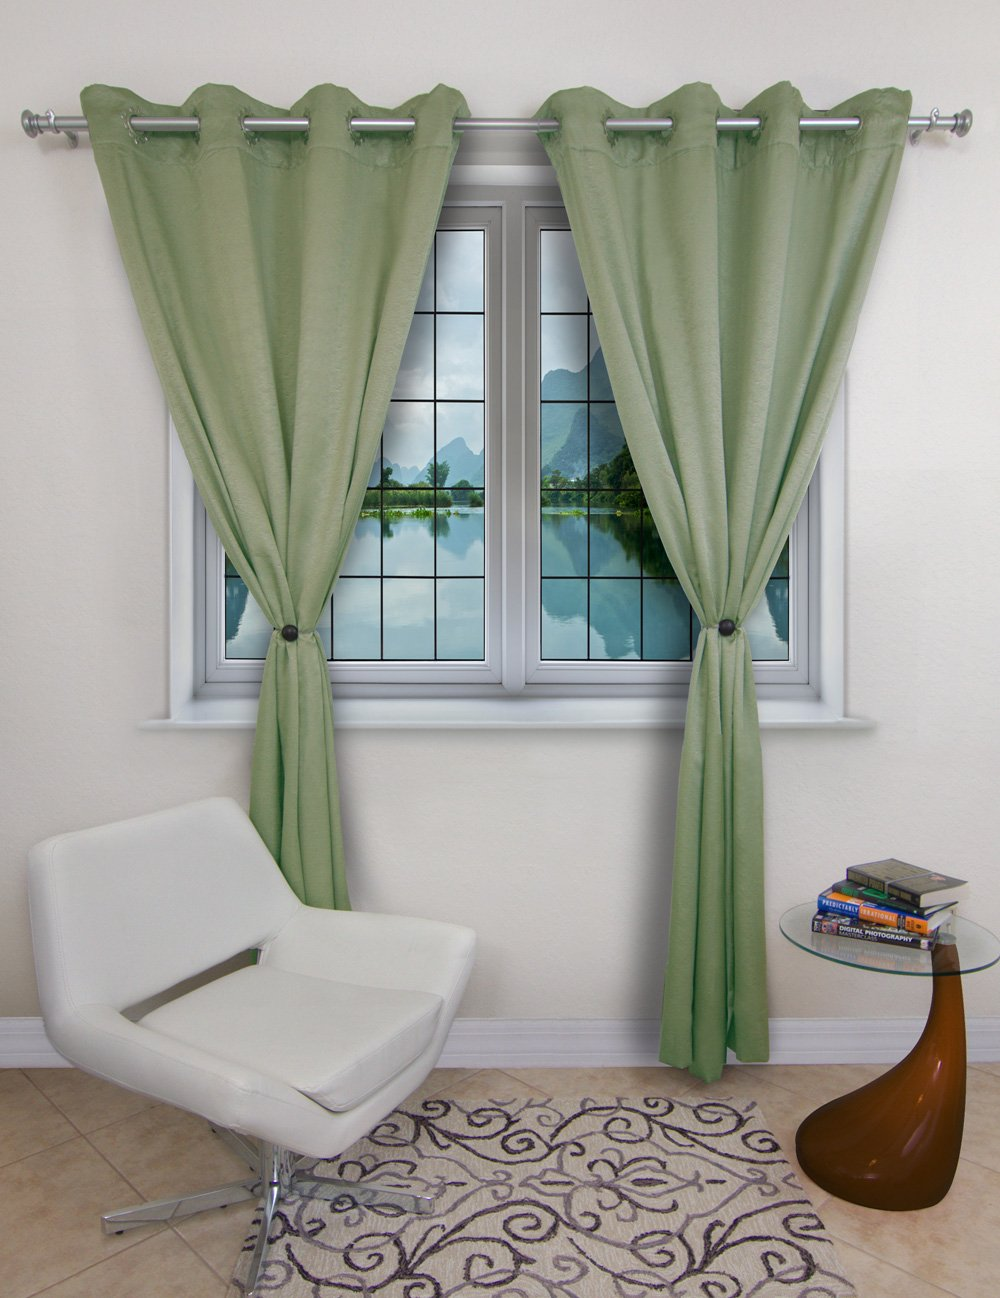 Curtain Tiebacks or Holdbacks, Curtain Clips - Magnetic Wood Buckle, MagnaClips Set of 2, Quadra (Chocolate)